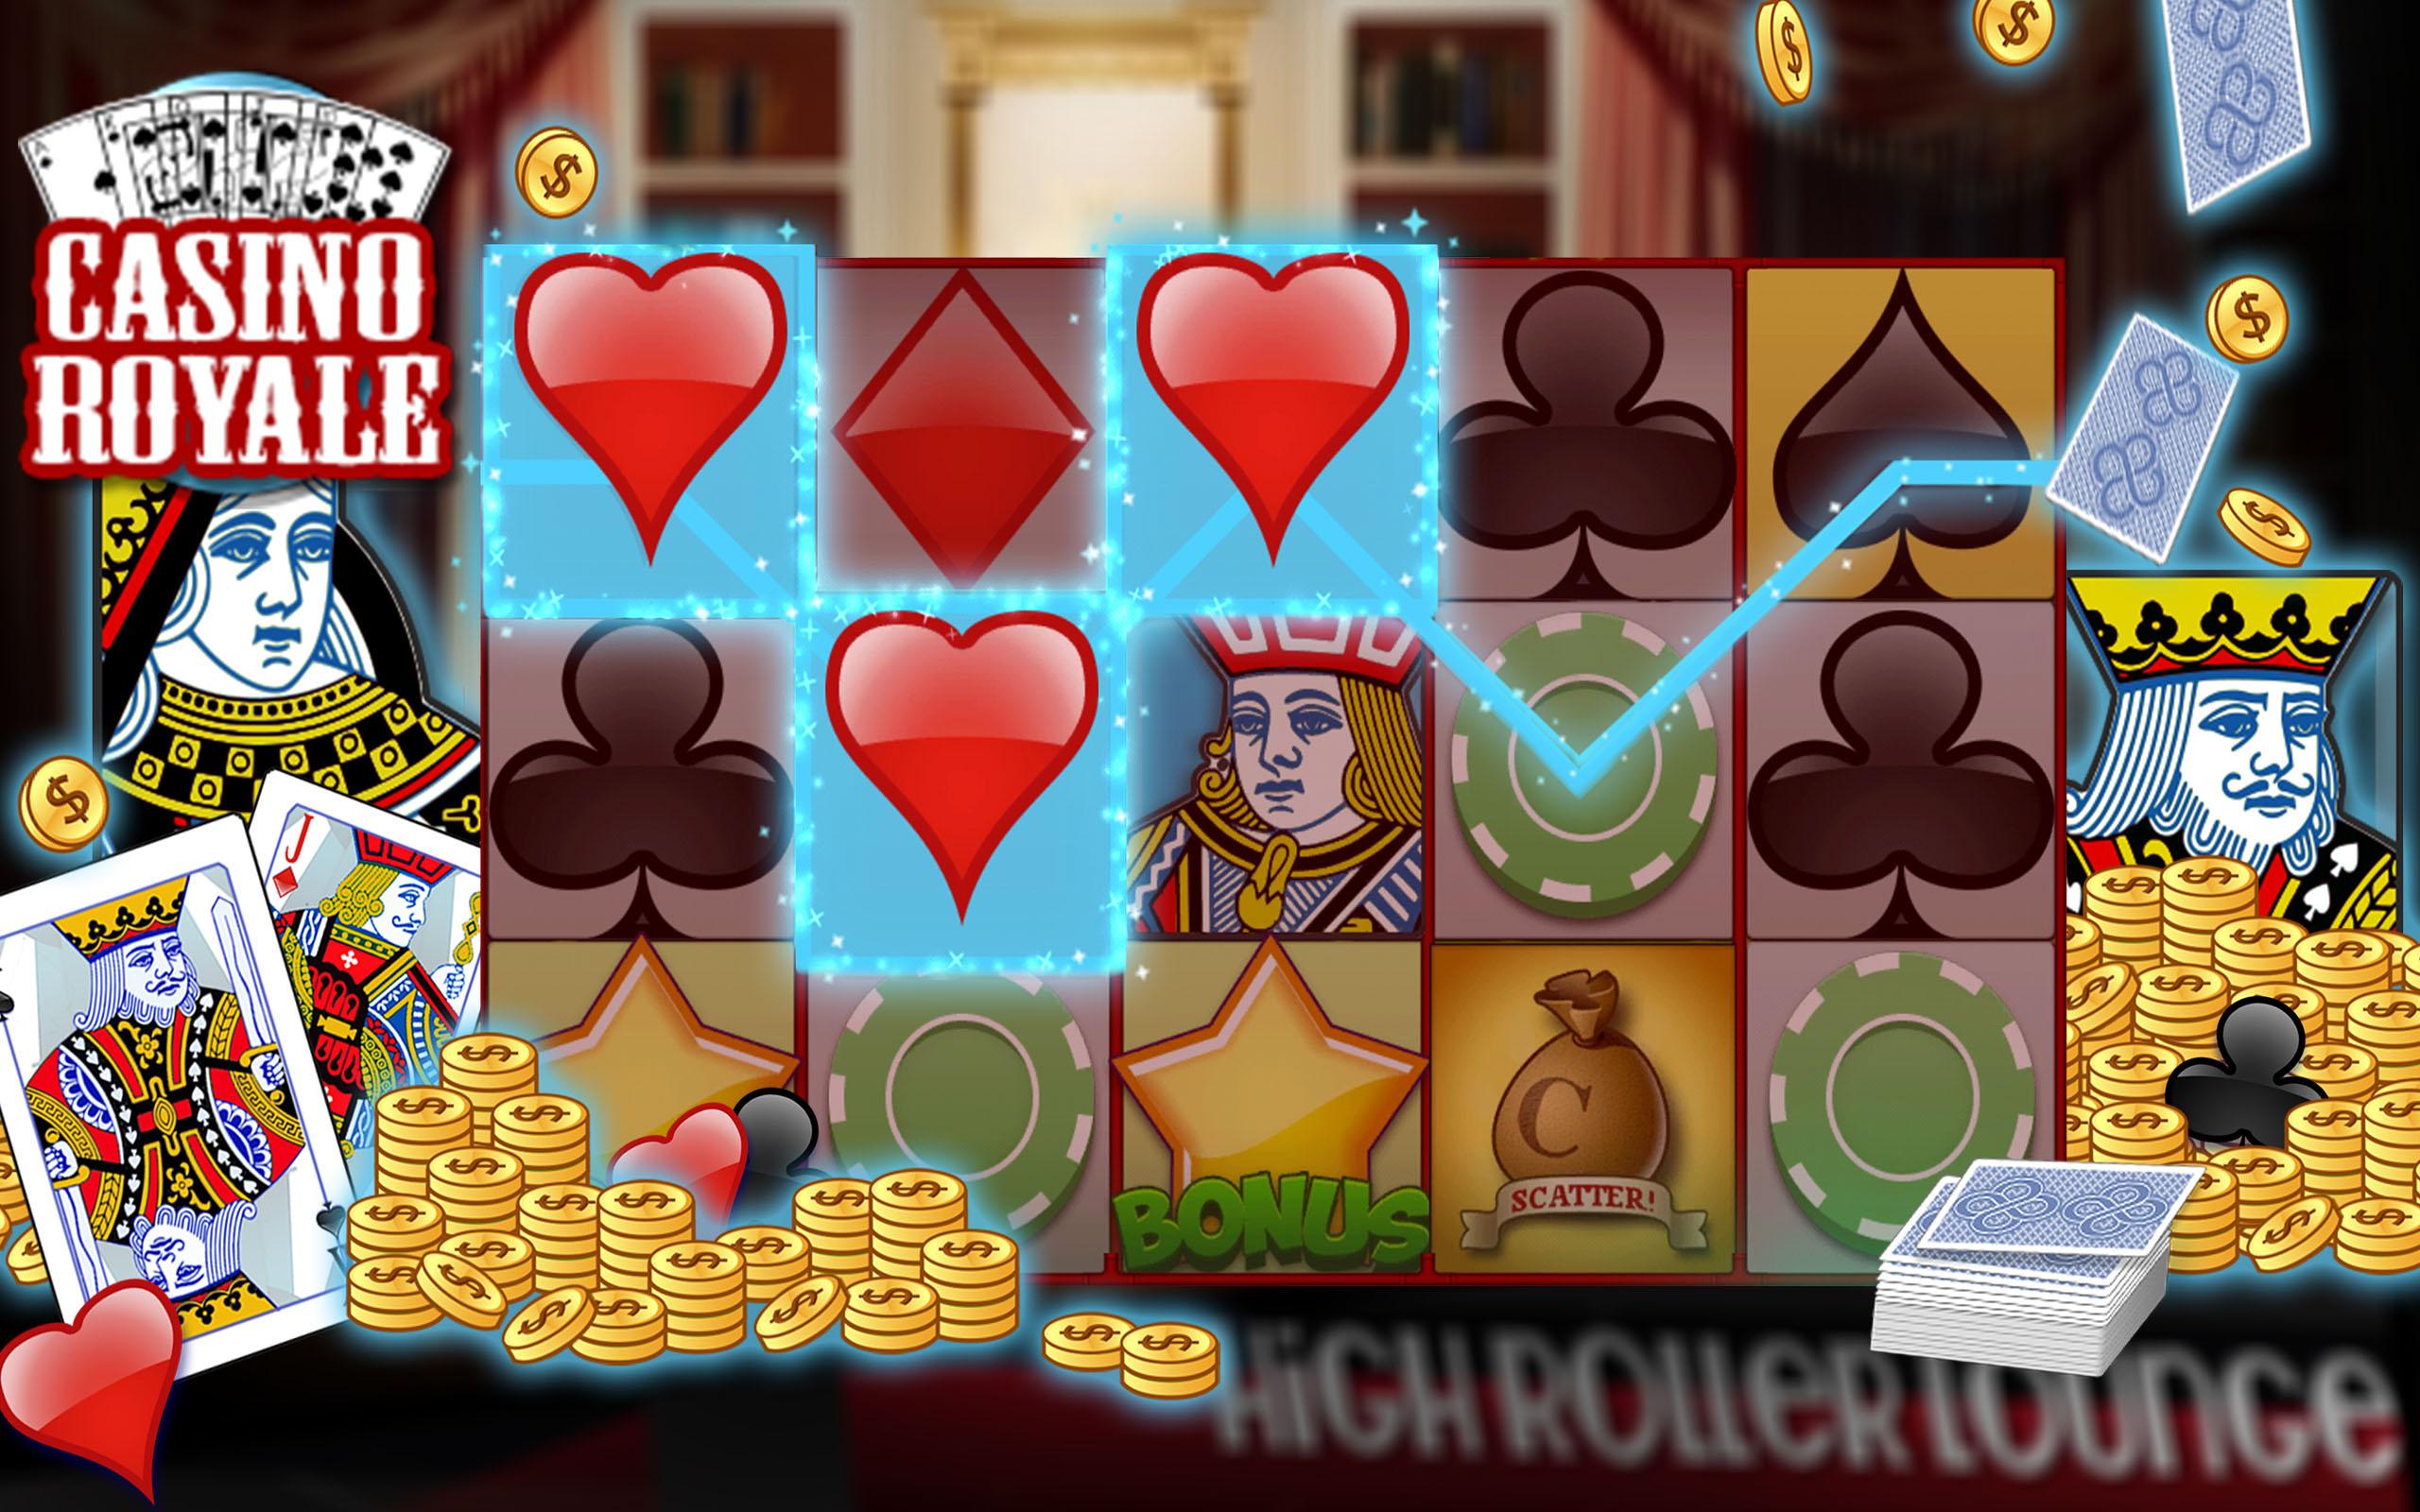 Google free casino slot games poker omaha regras